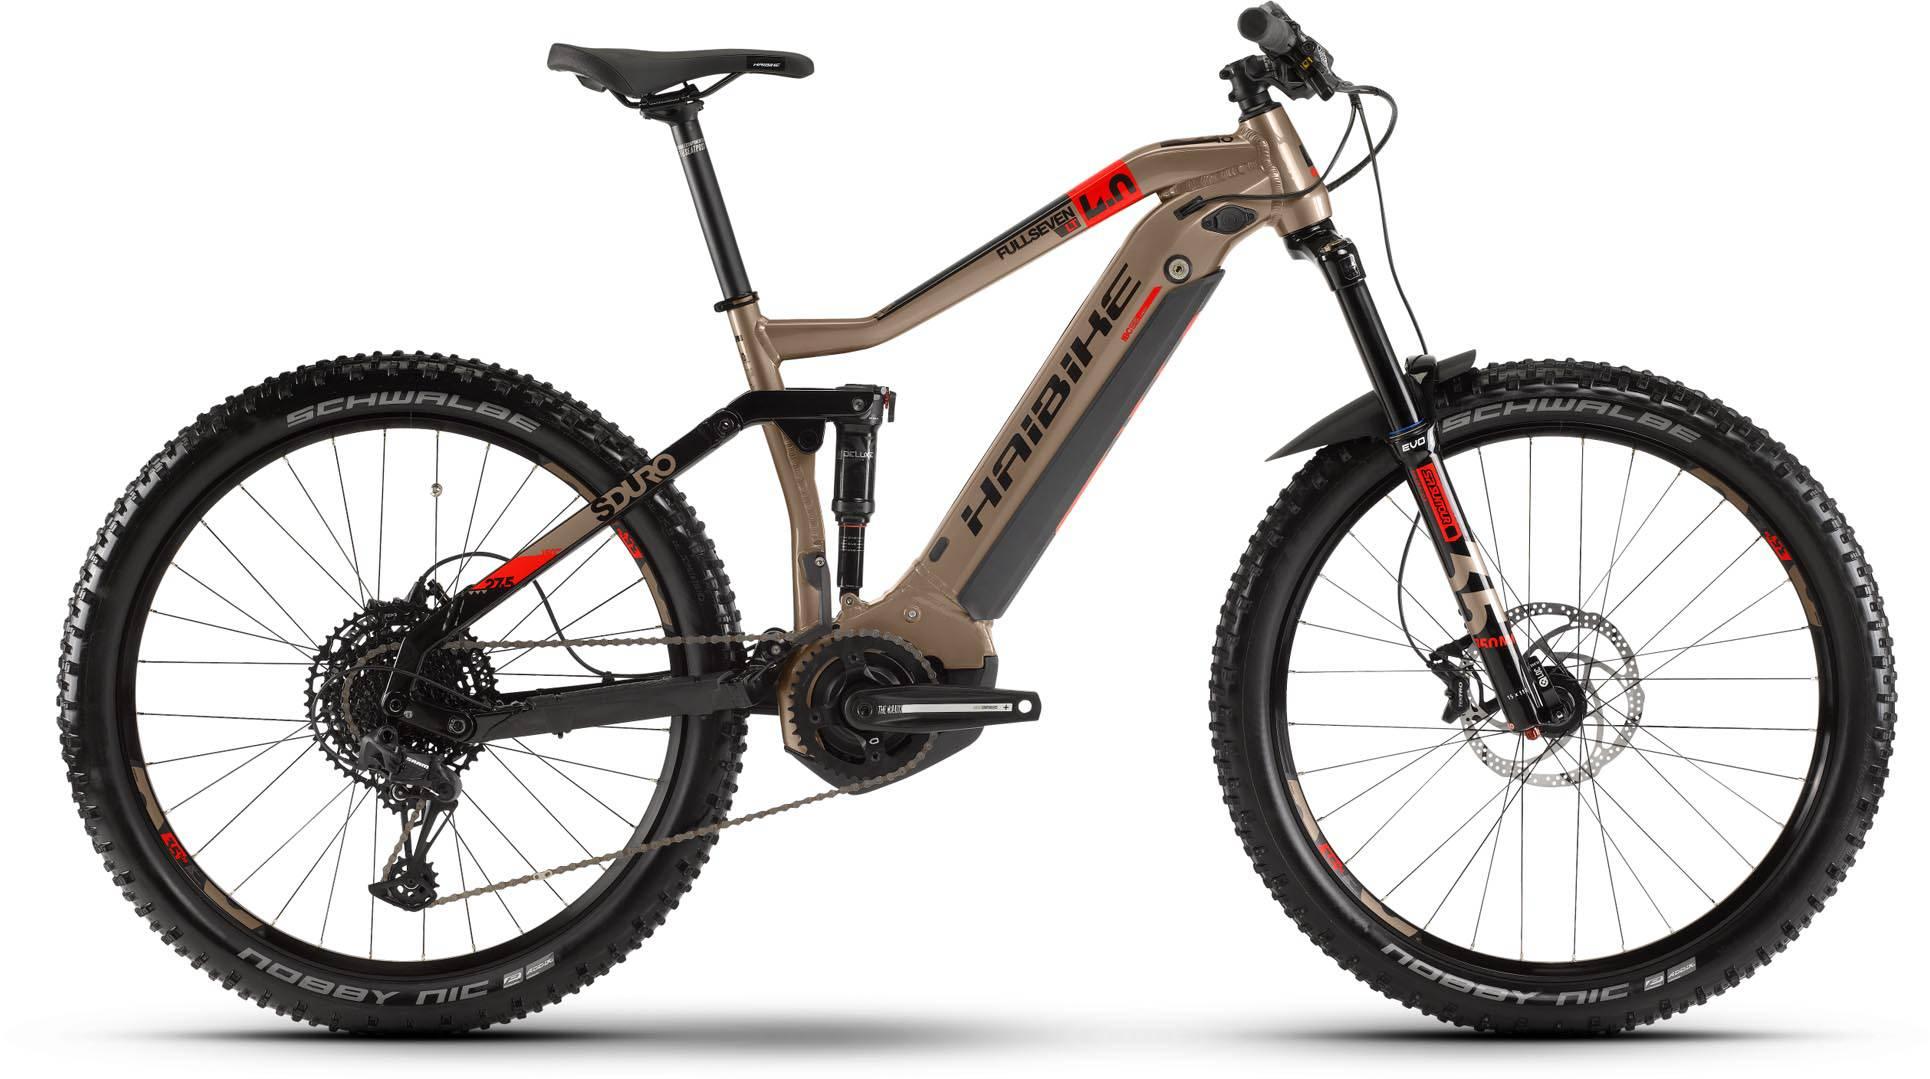 haibike sduro fullseven lt 4 0 500wh metallic rot schwarz 2020 e bike mountainbike fully. Black Bedroom Furniture Sets. Home Design Ideas